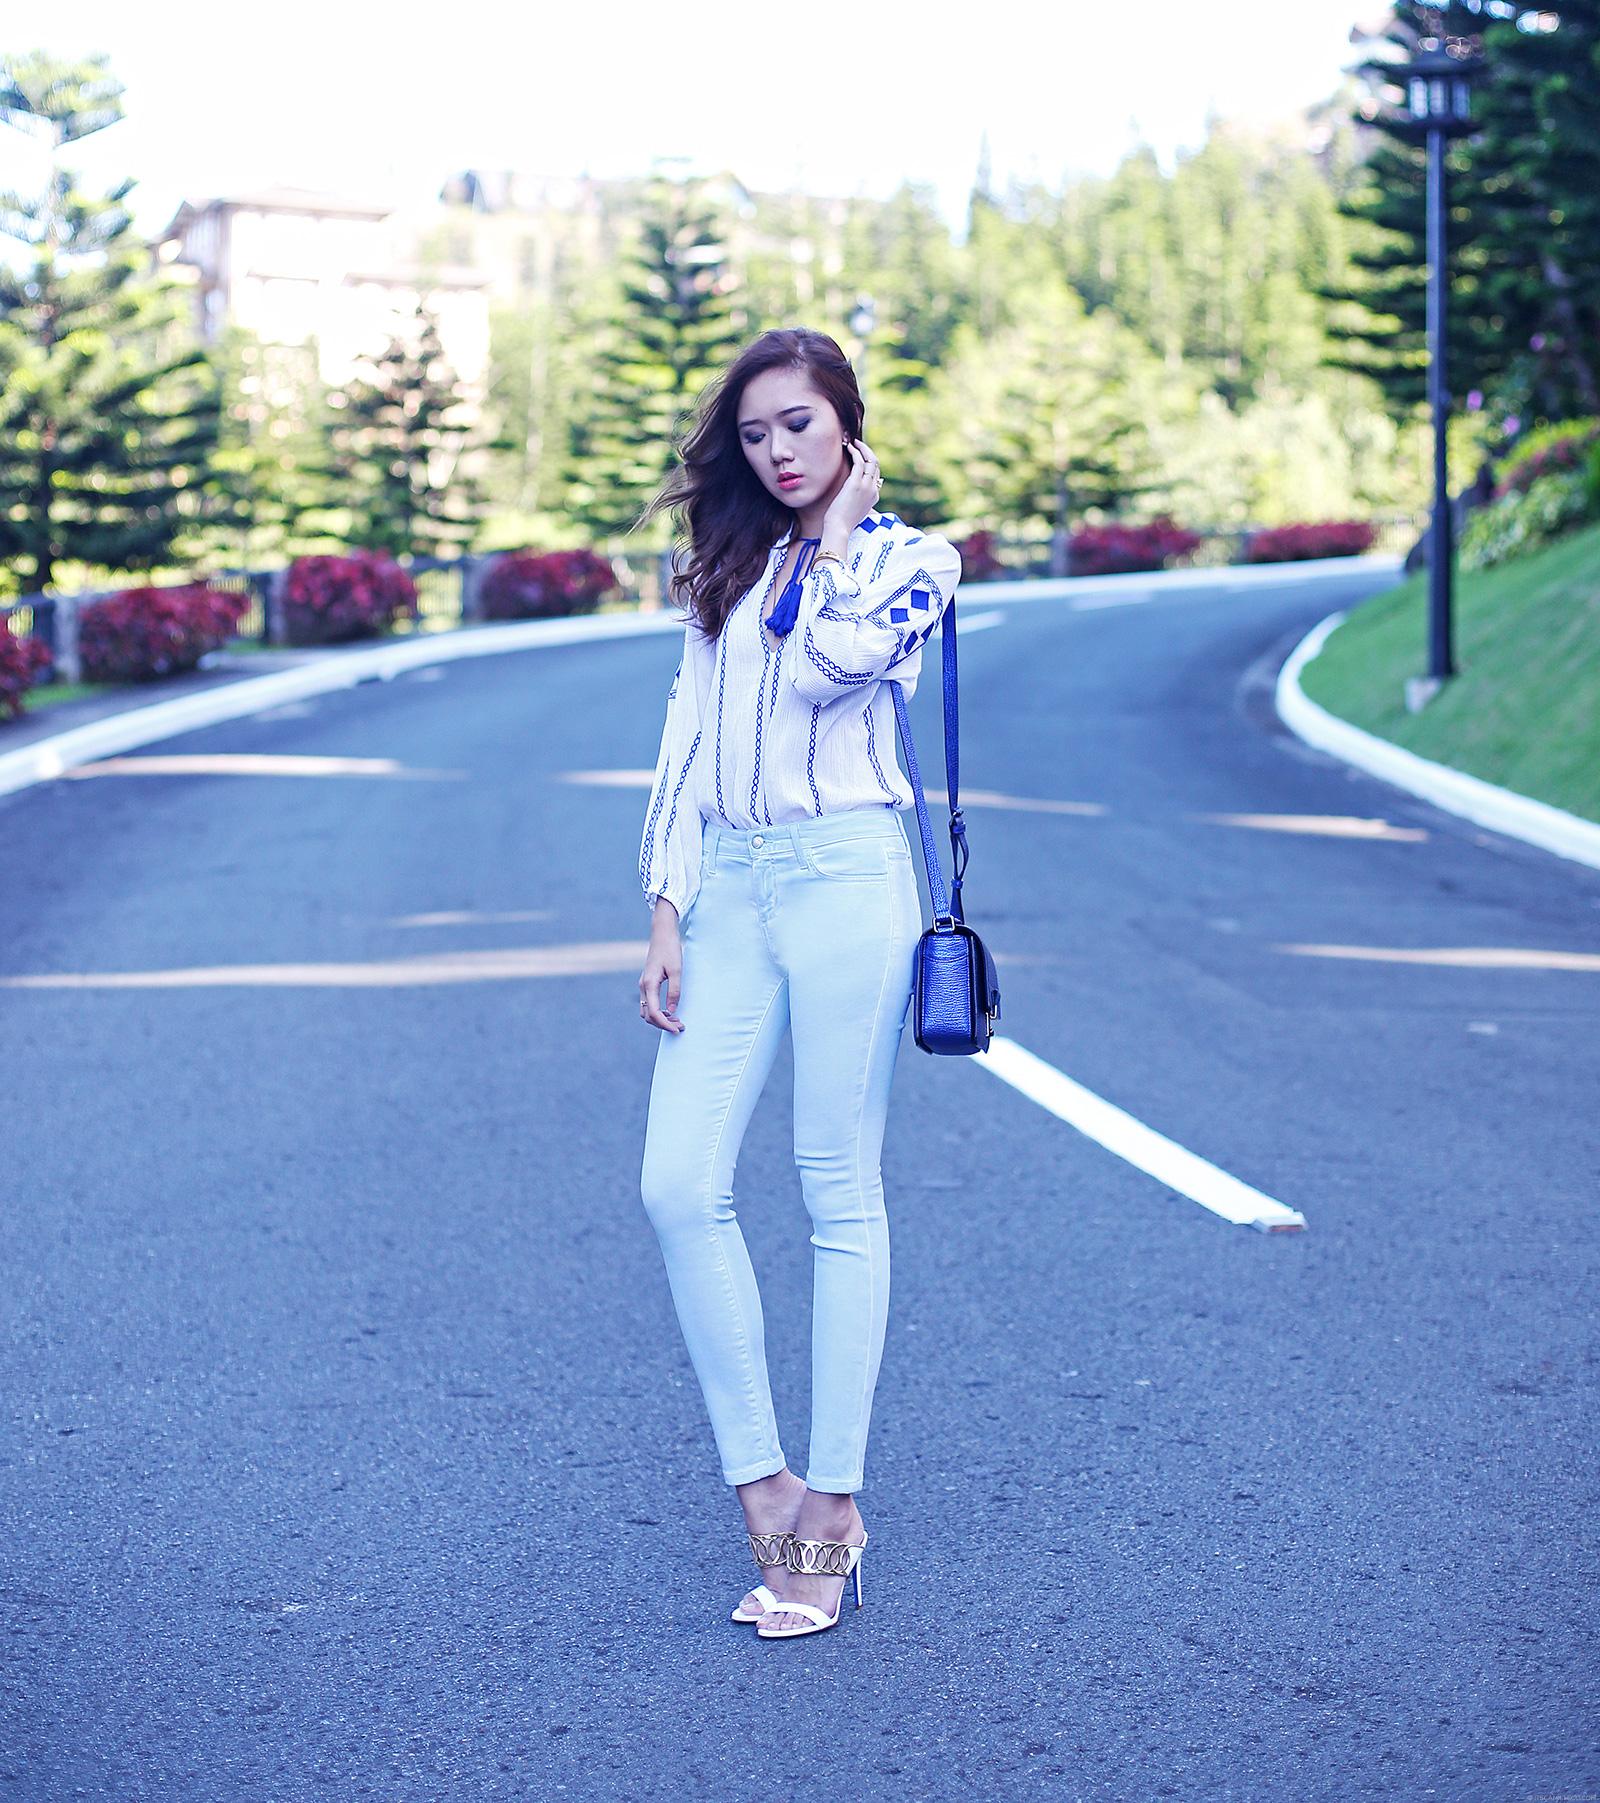 Joe's Jeans, 3.1 Phillip Lim, Loriblu | www.itscamilleco.com